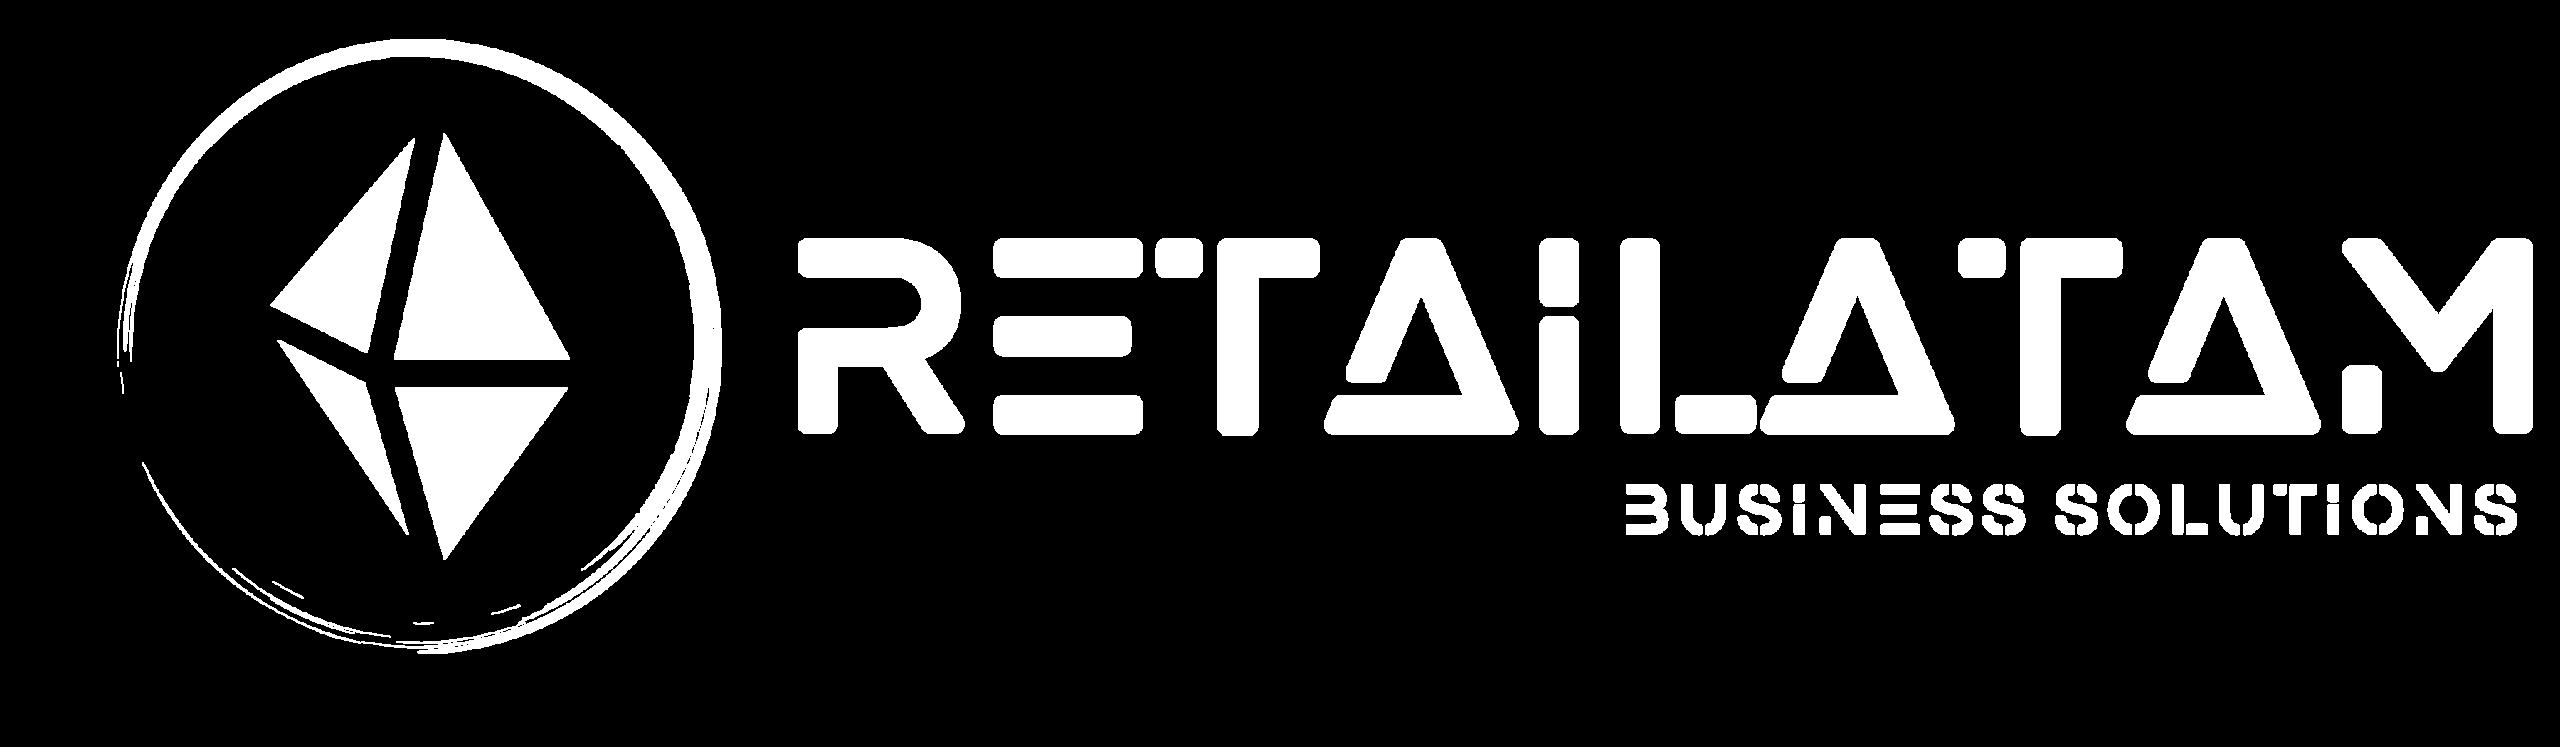 RETAILATAM Business Solutions